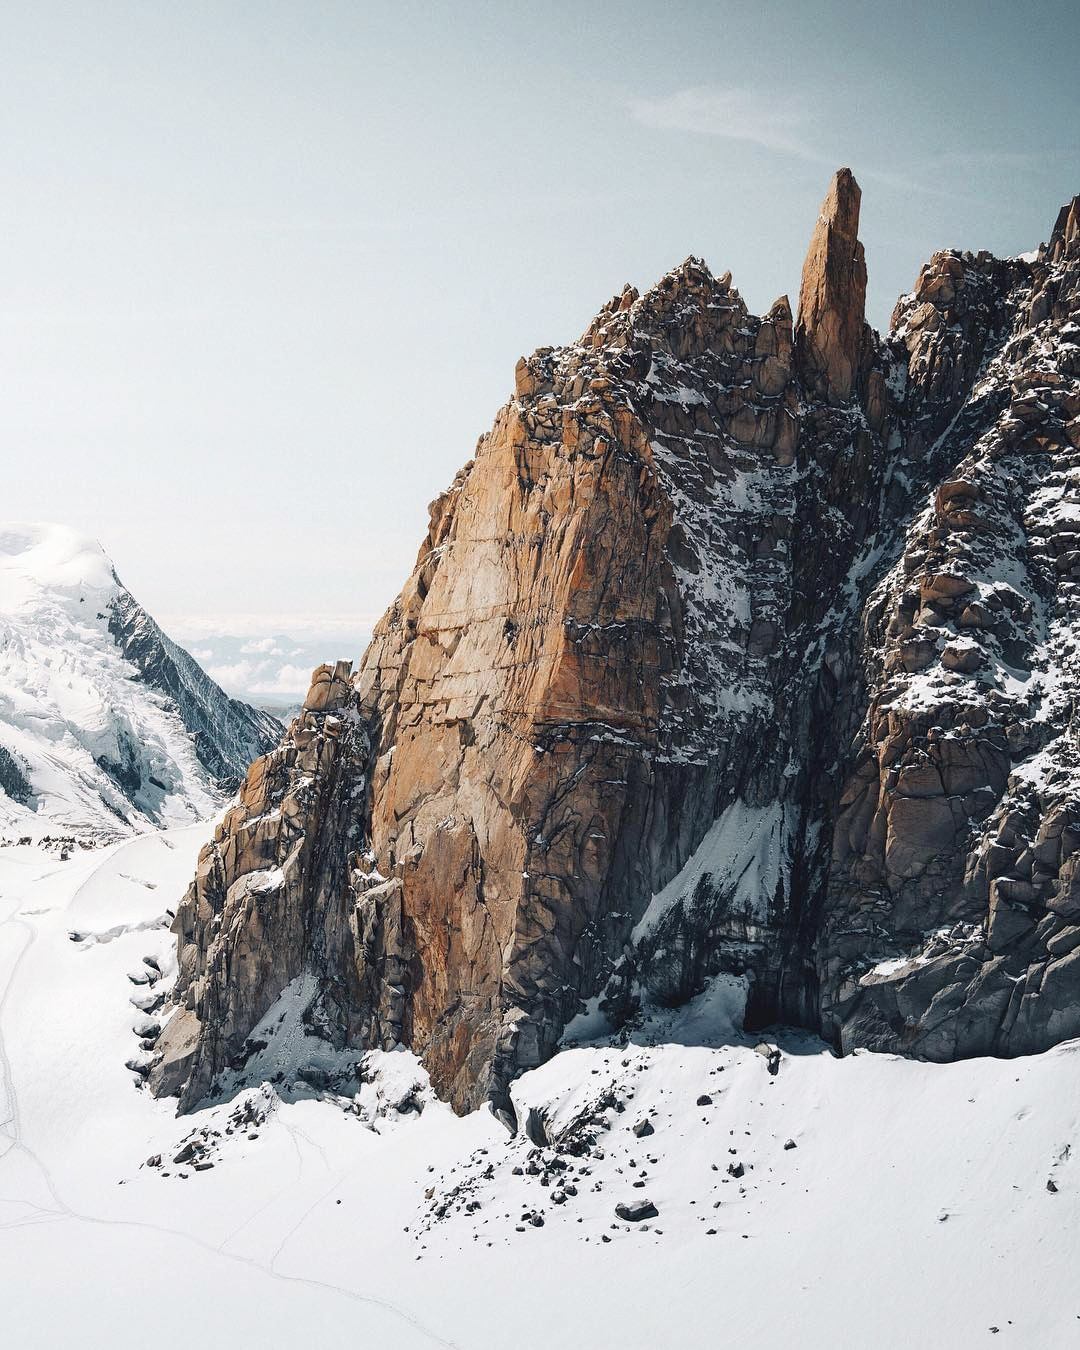 #mountain #mountain #mountainlife #mountainview #mountainlove #MountainScape #mountaintop #mountainlovers #mountainclimbing #mountaineer #mountainstones #mountaindew #mountainesia #mountainman #mountaingirl #mountainside #mountainlover #mountainslovers #mountainbikes  #mountainliving #mountainhome #mountainworld  #mountainphotography #mountainviews